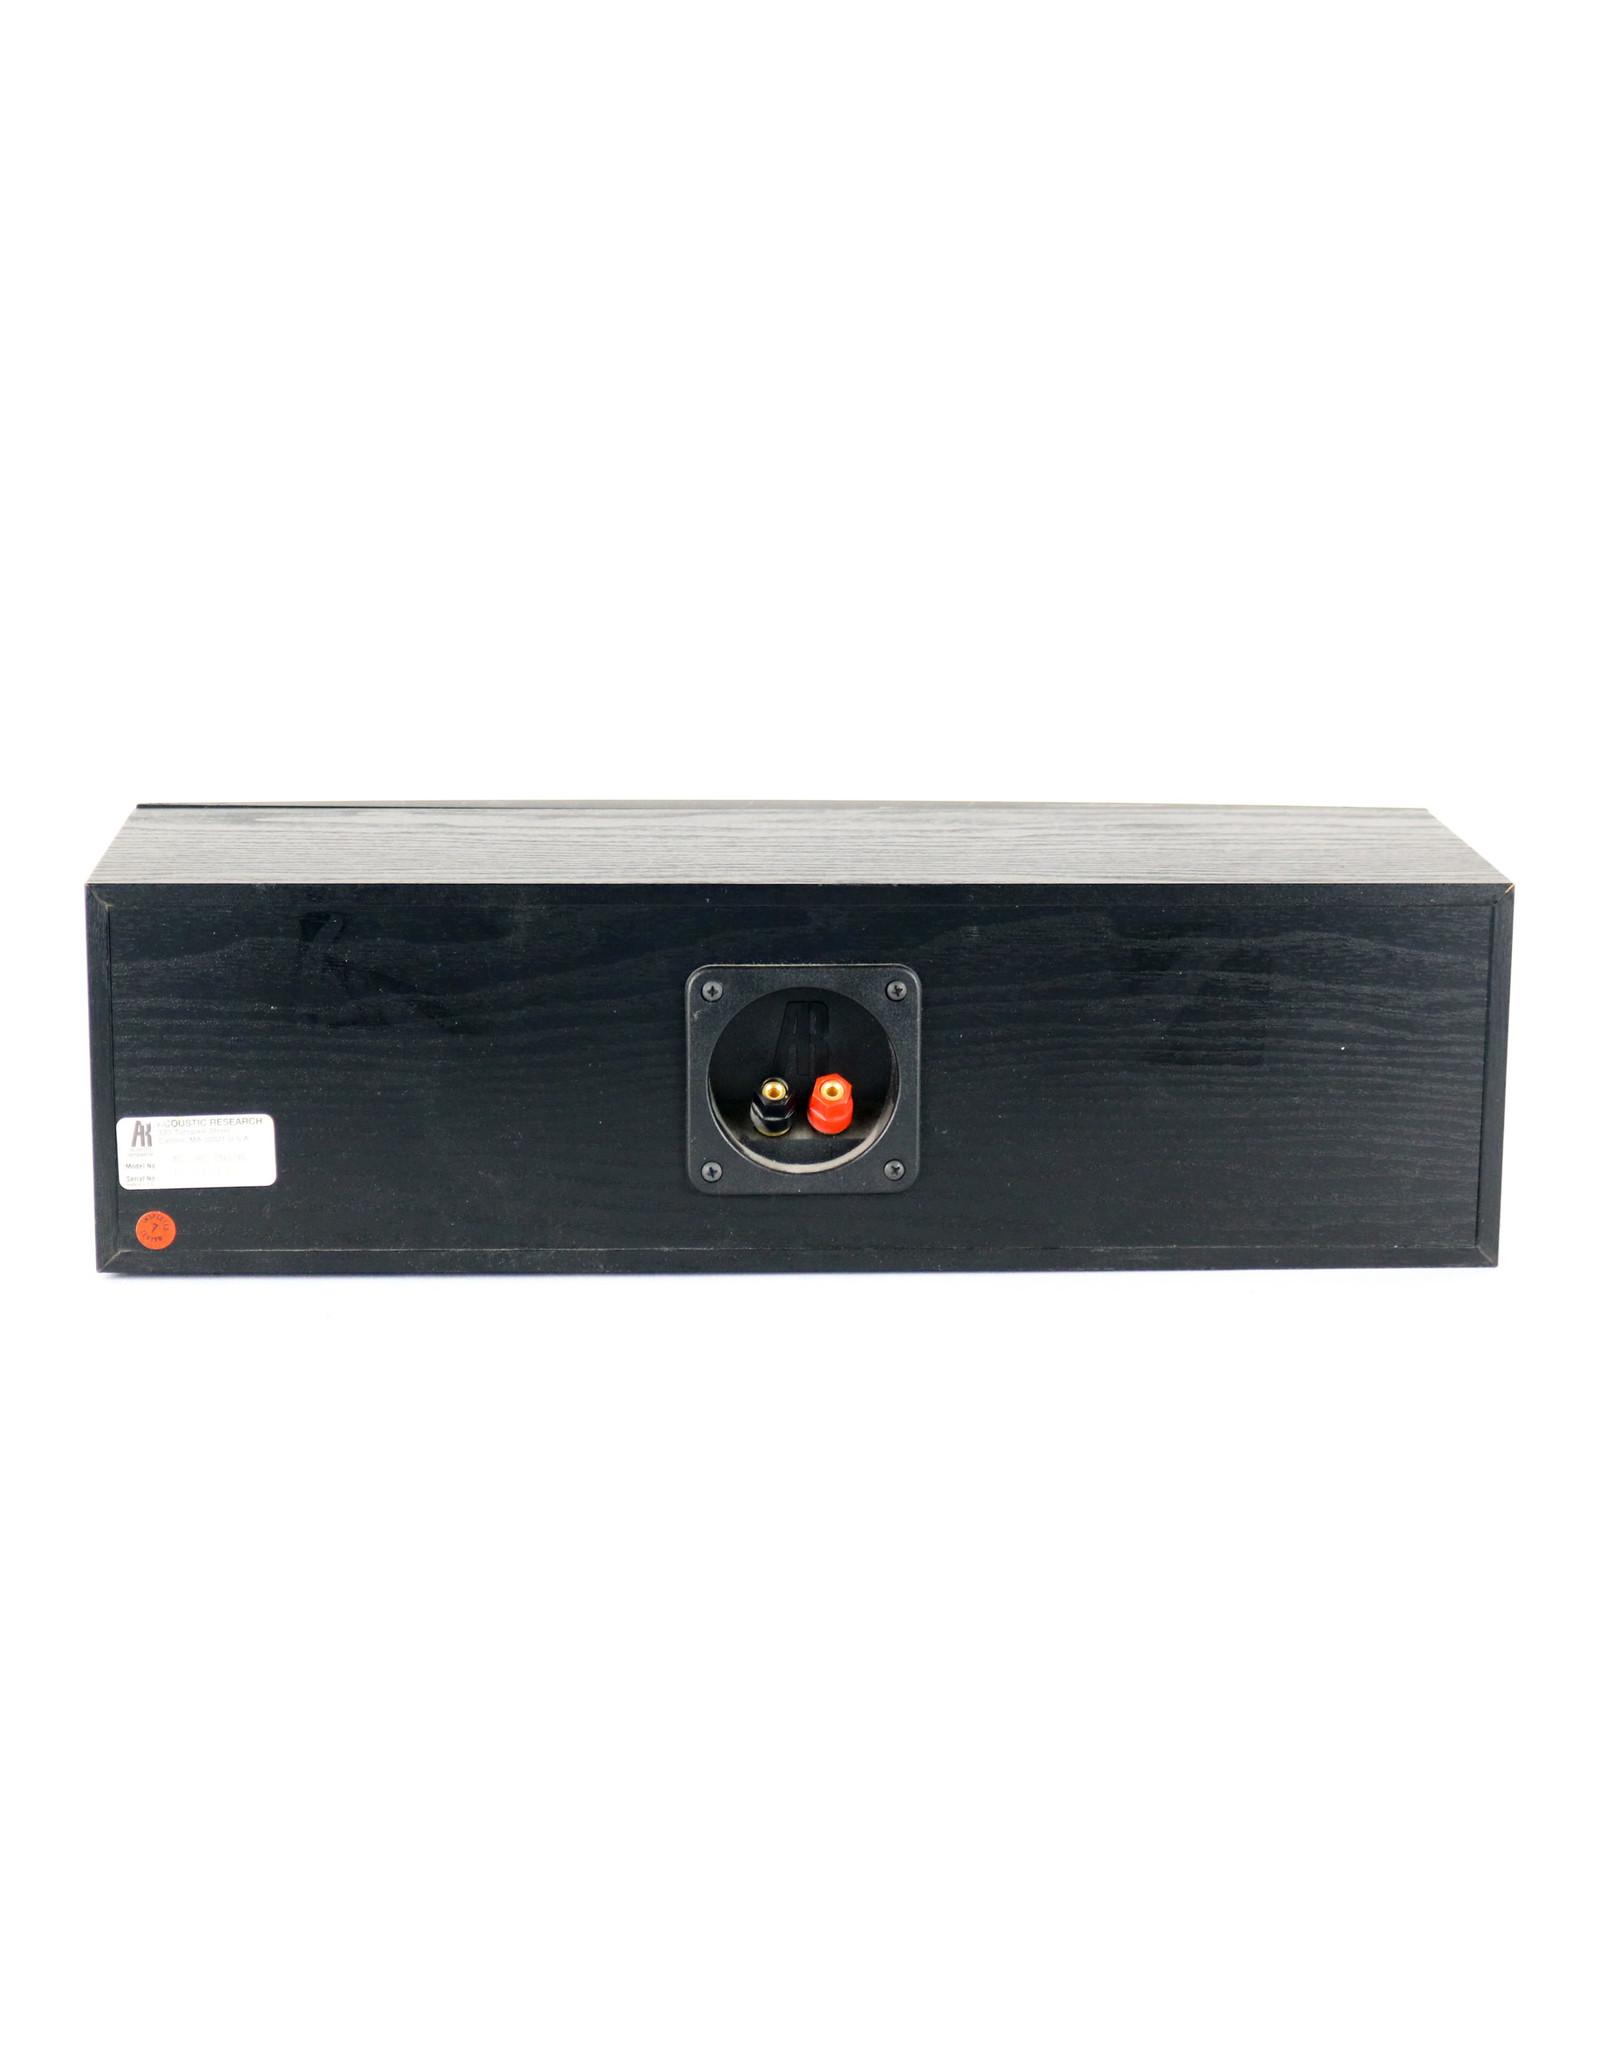 AR AR MC.1 Holographic Center Speaker USED